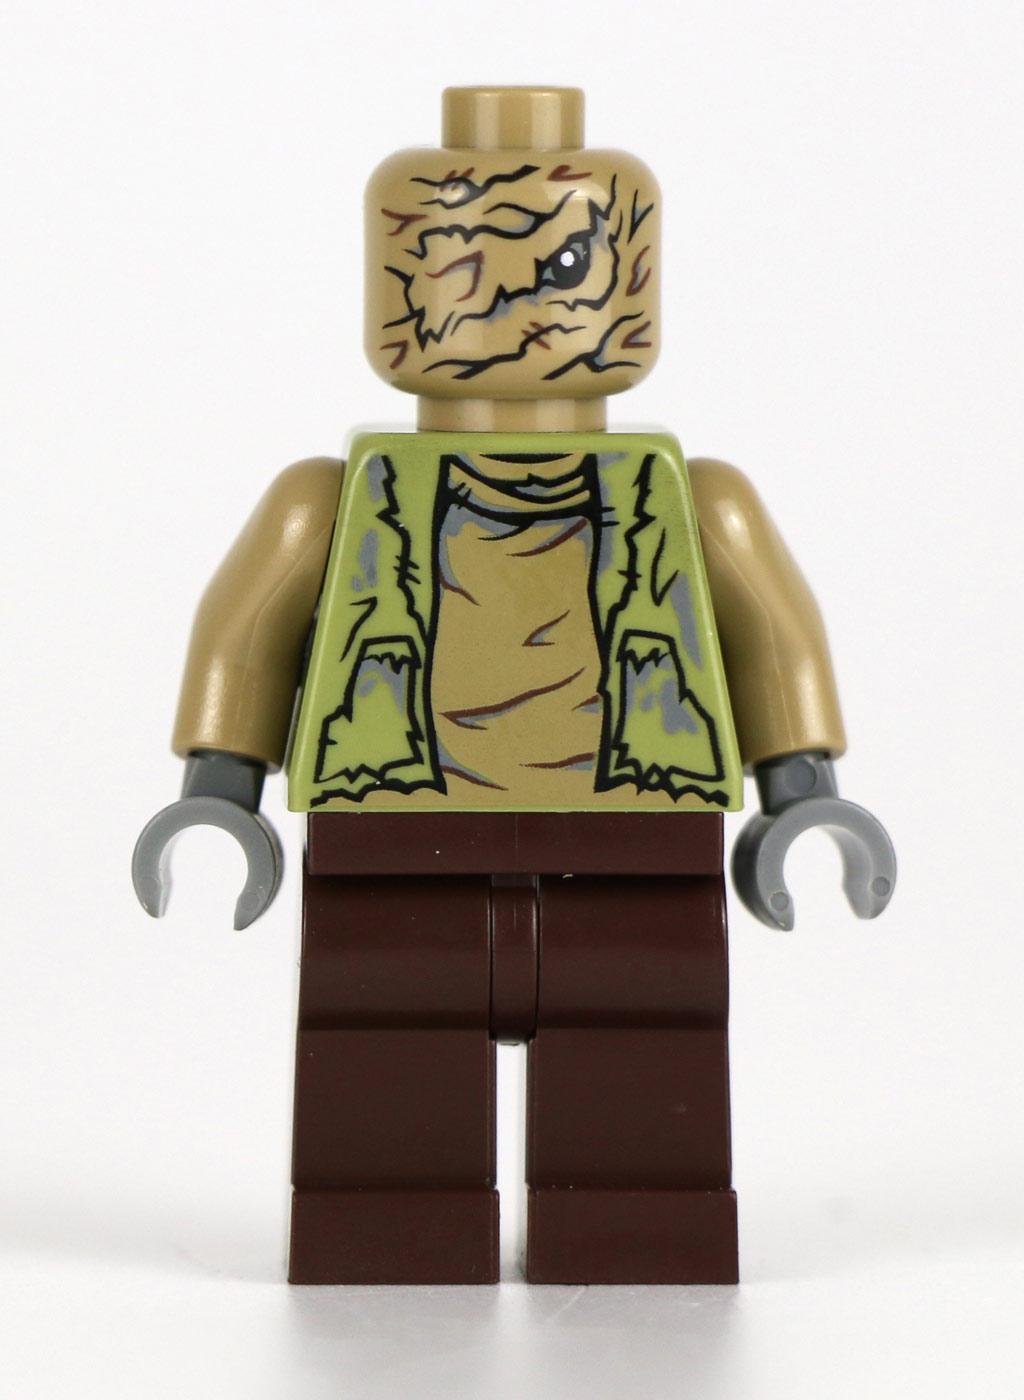 Exklusive Minifigur: Unkars Brute | © Andres Lehmann  / zusammengebaut.com